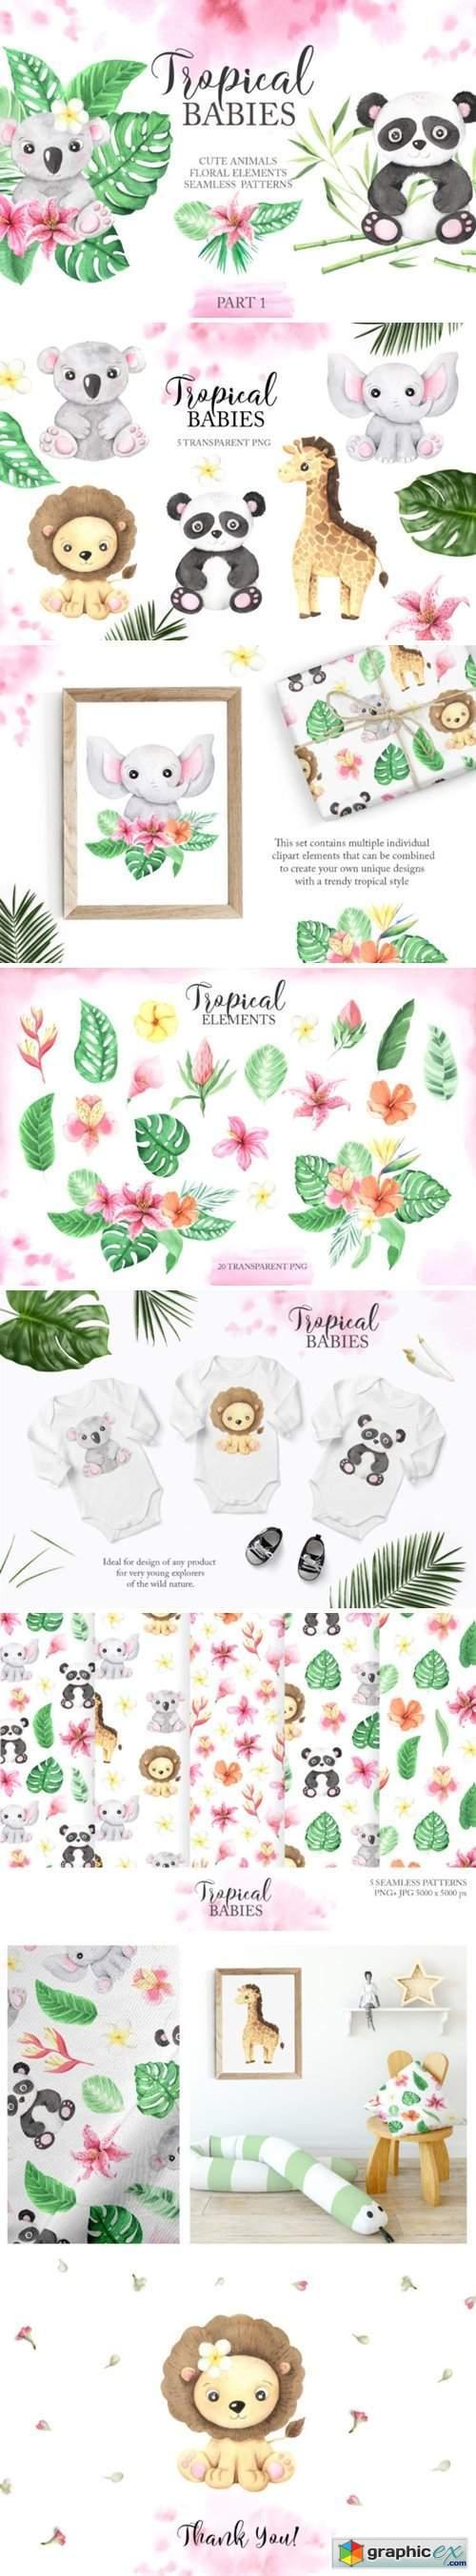 Watercolor Tropical Babies Set 1